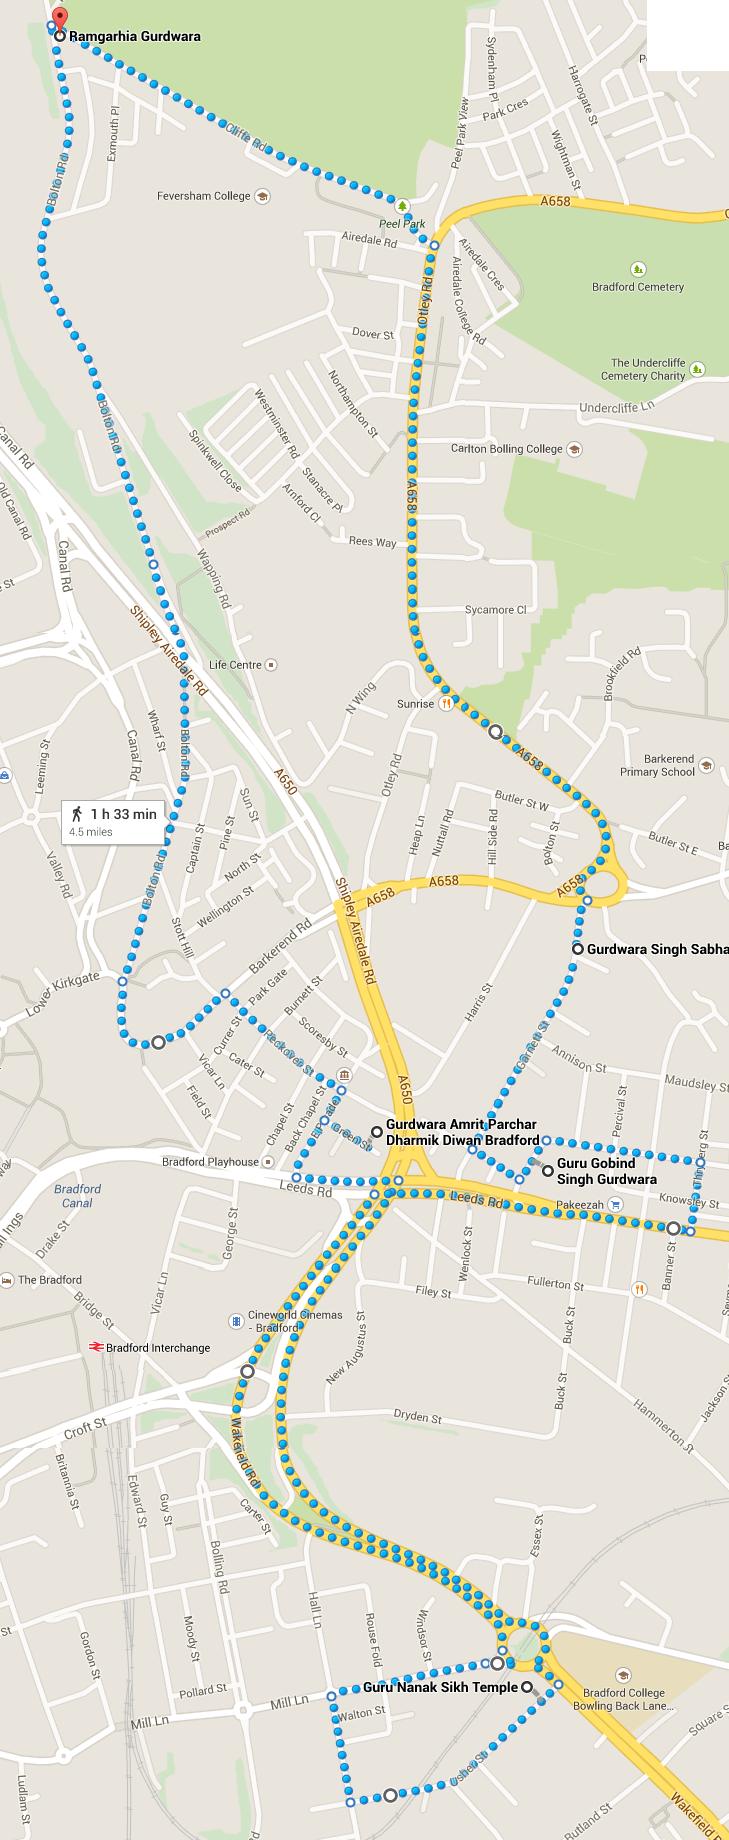 The Vaisakhi 2015 Nagar Kirtan route